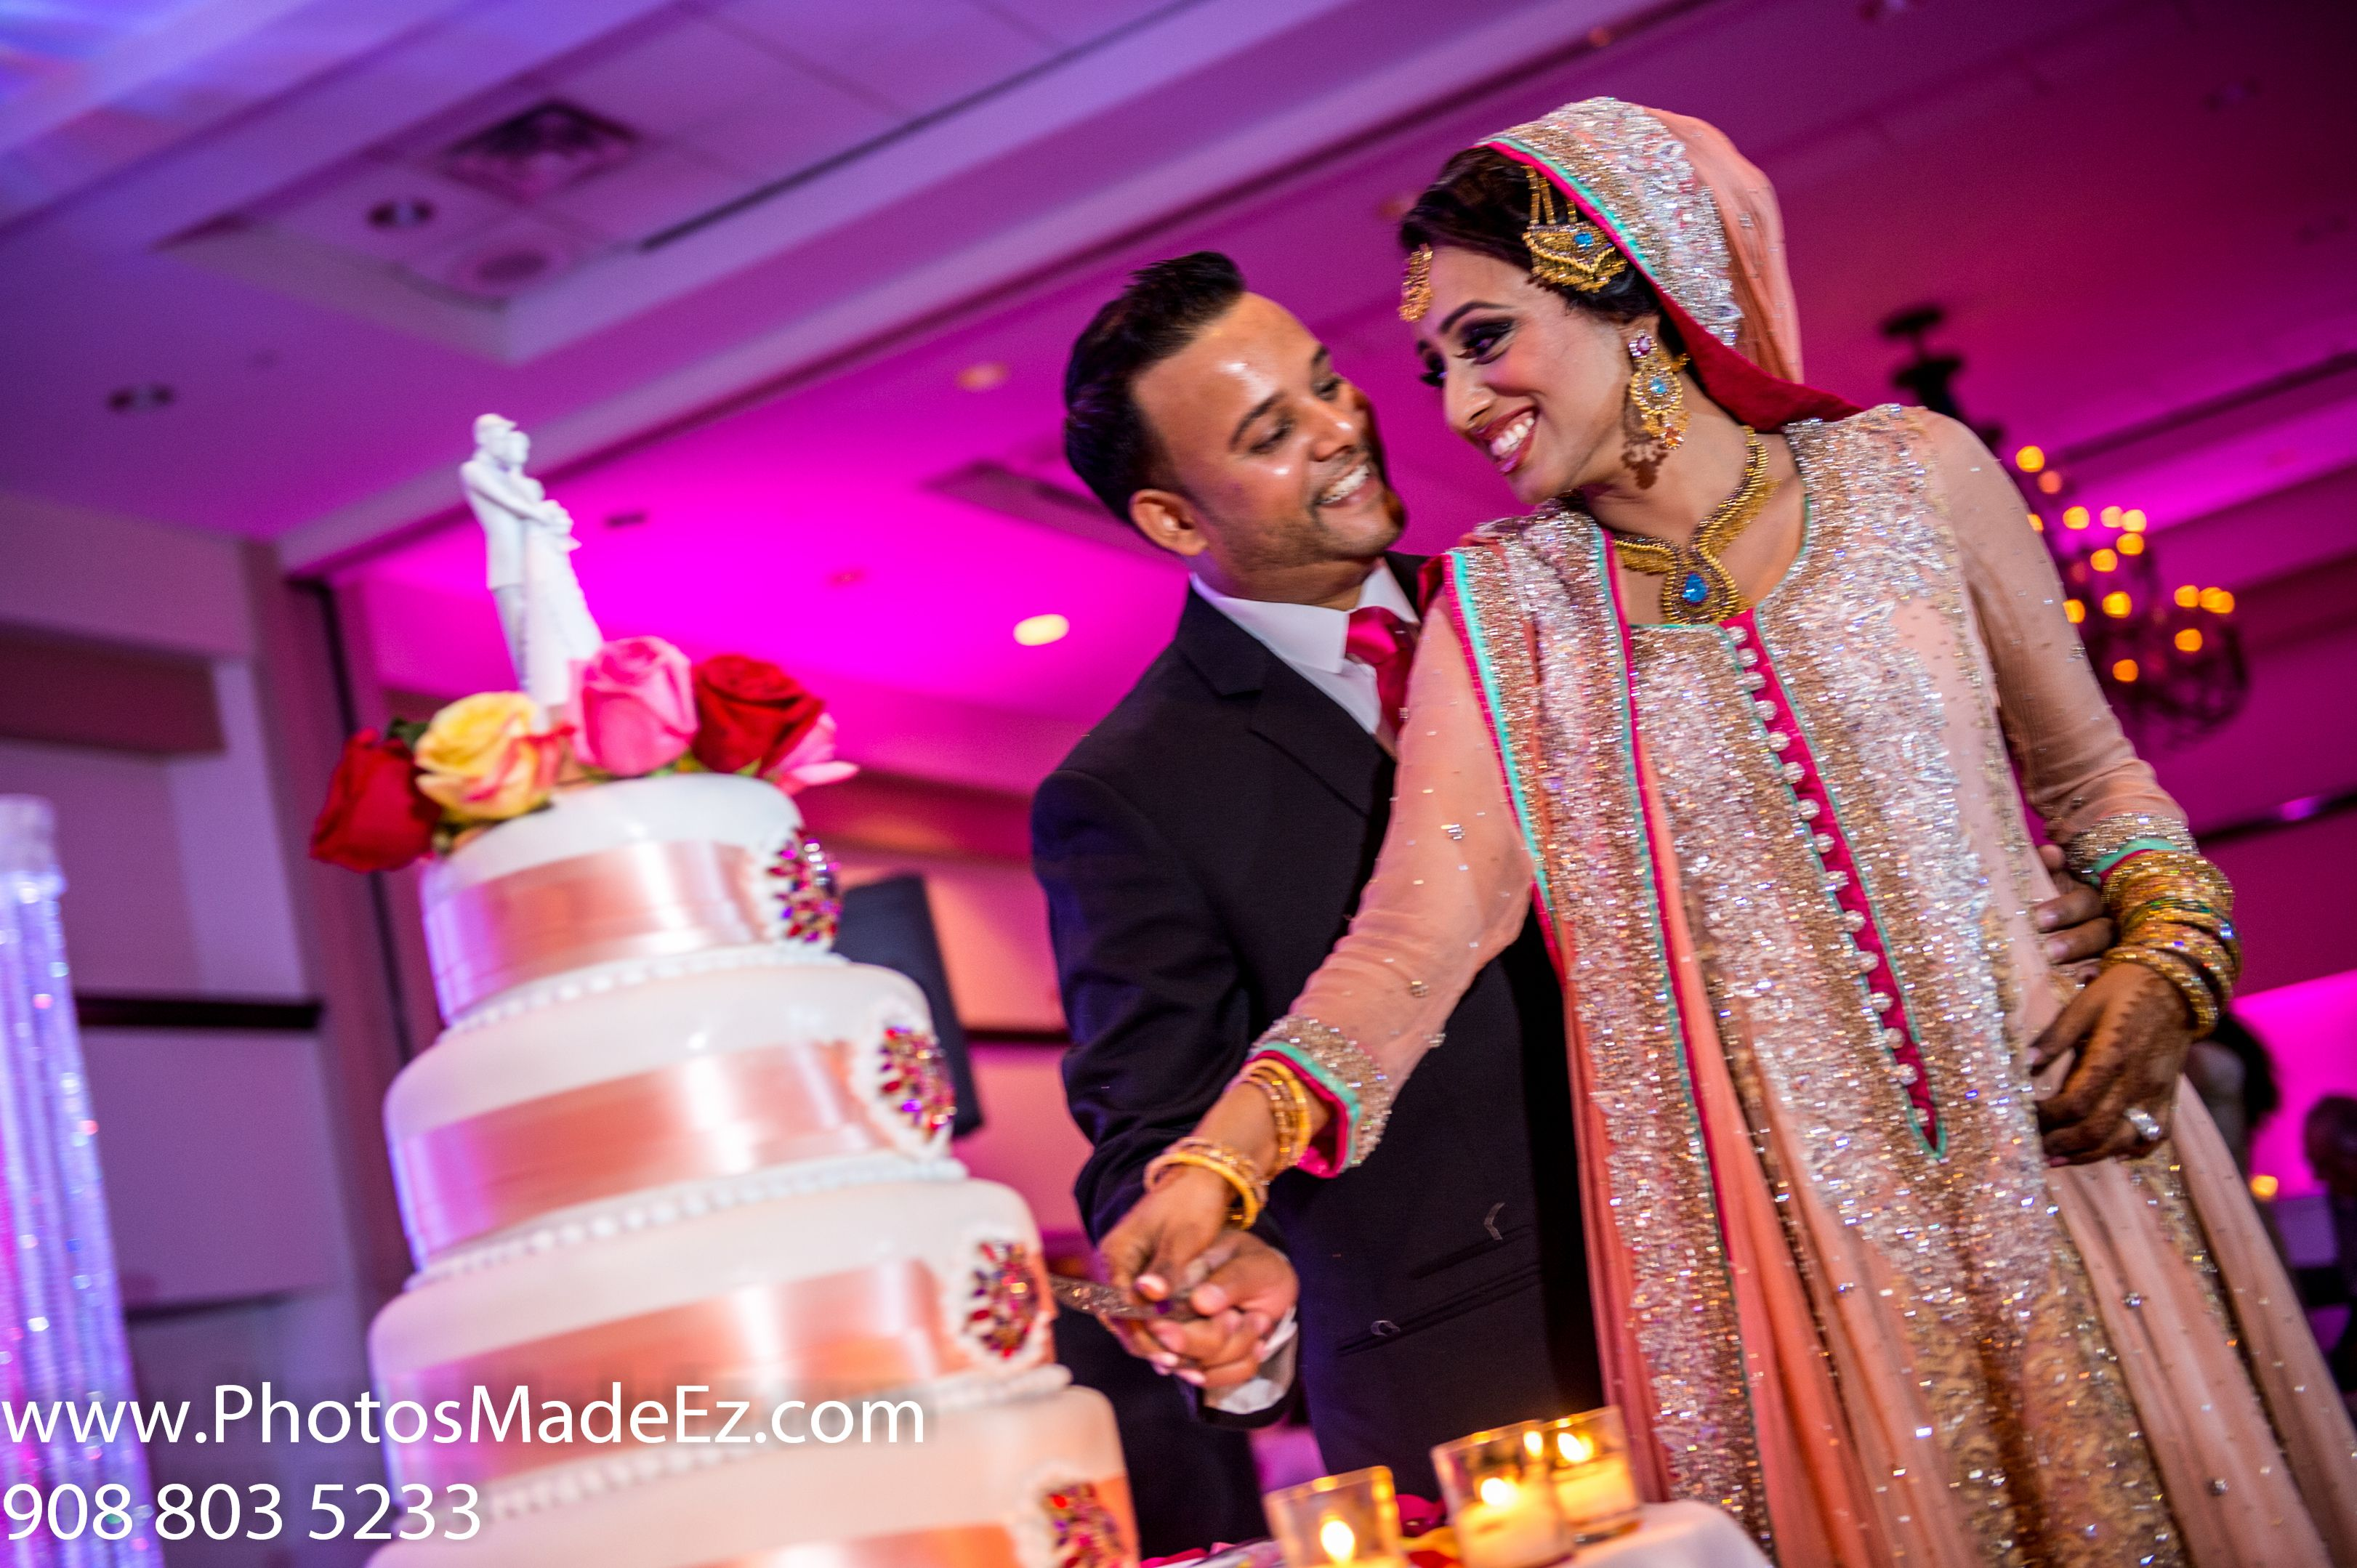 Pin on Wedding Cake Photos by PhotosMadeEz